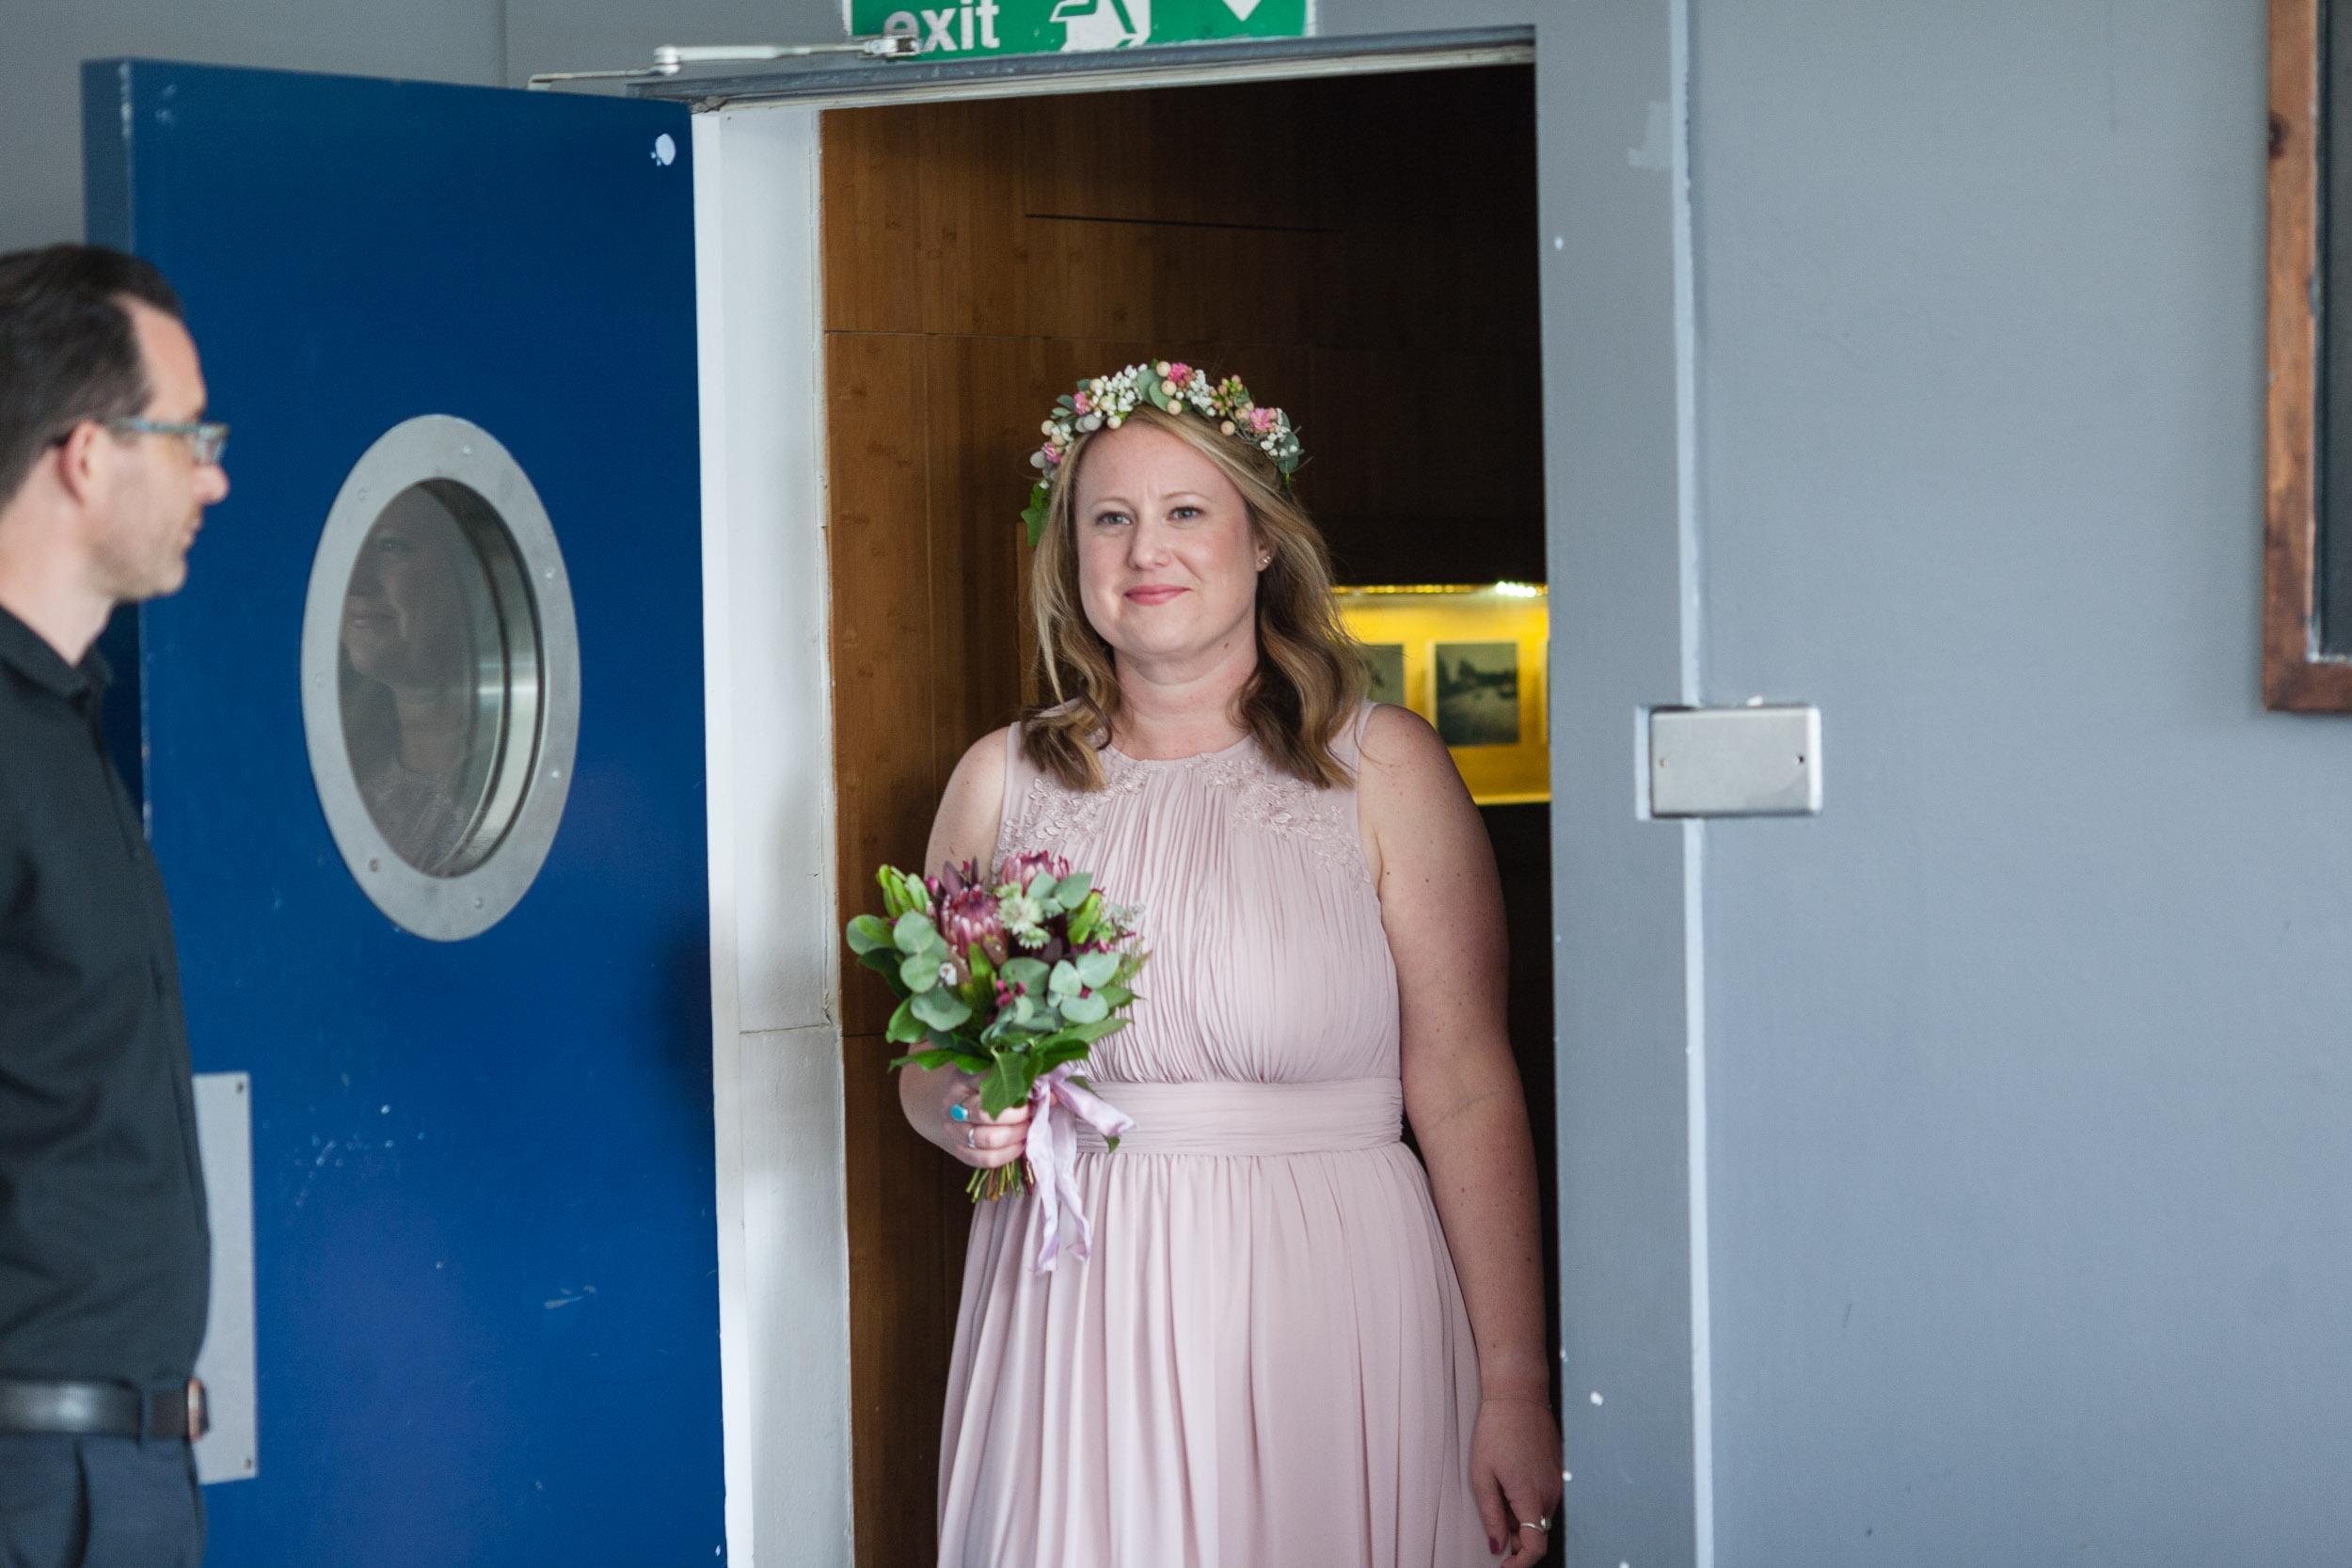 brockwell-lido-brixton-herne-hill-wedding-117.jpg